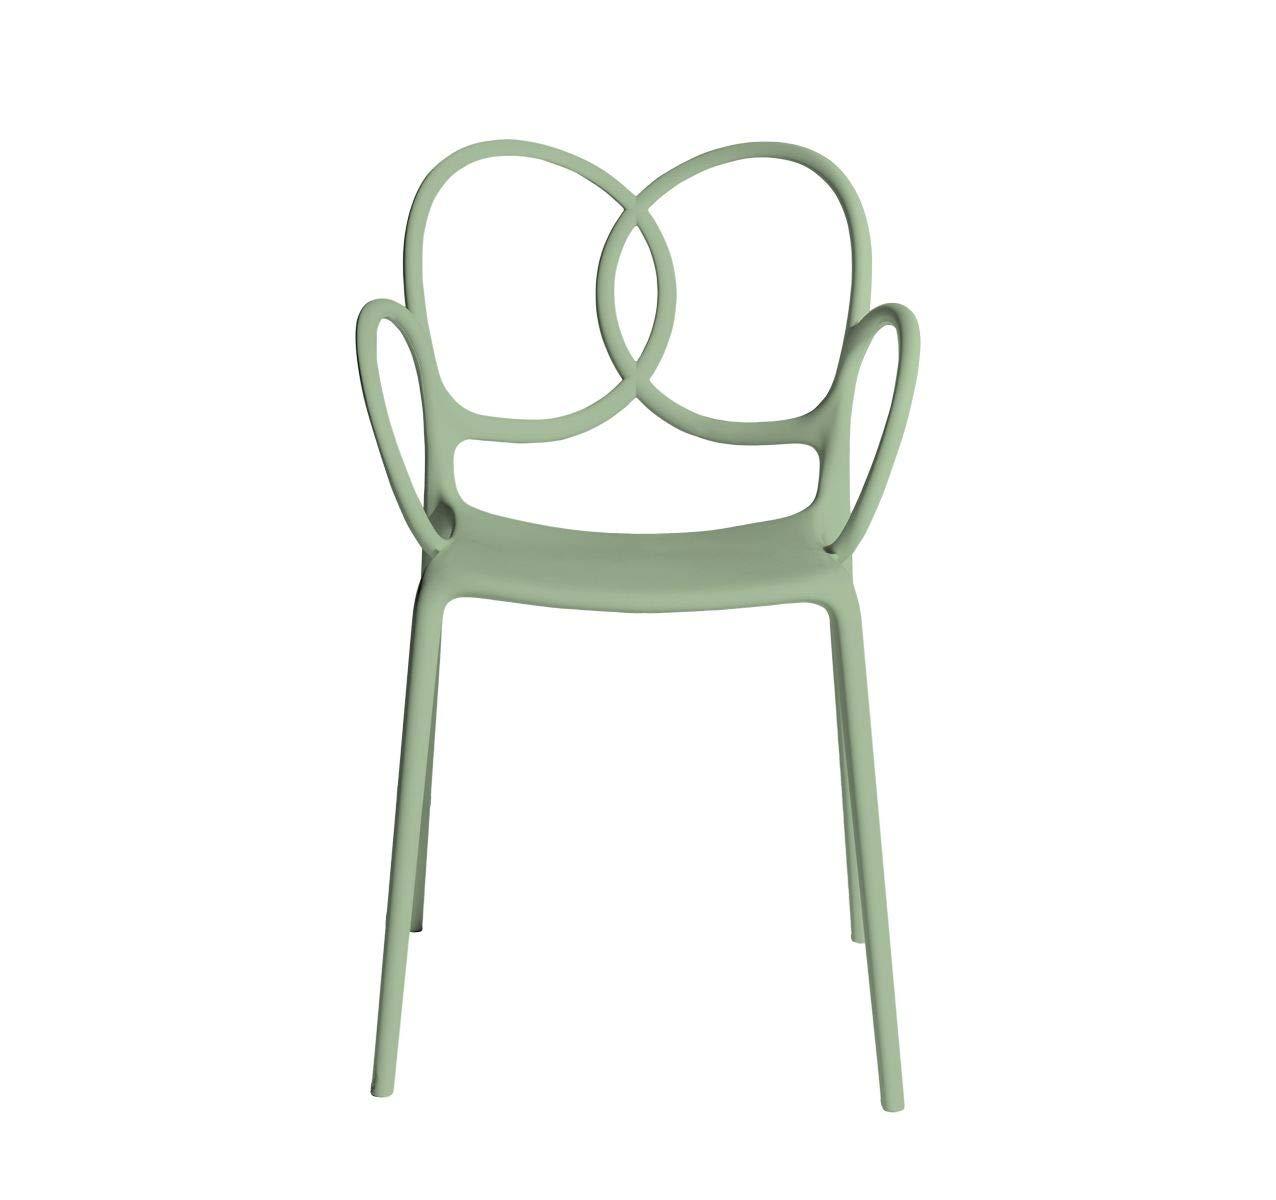 Driade Sissi Armlehnstuhl - grün - Ludovica & Roberto Palomba - Design - Gartenstuhl - Küchenstuhl - Speisezimmerstuhl - Terrassenstuhl